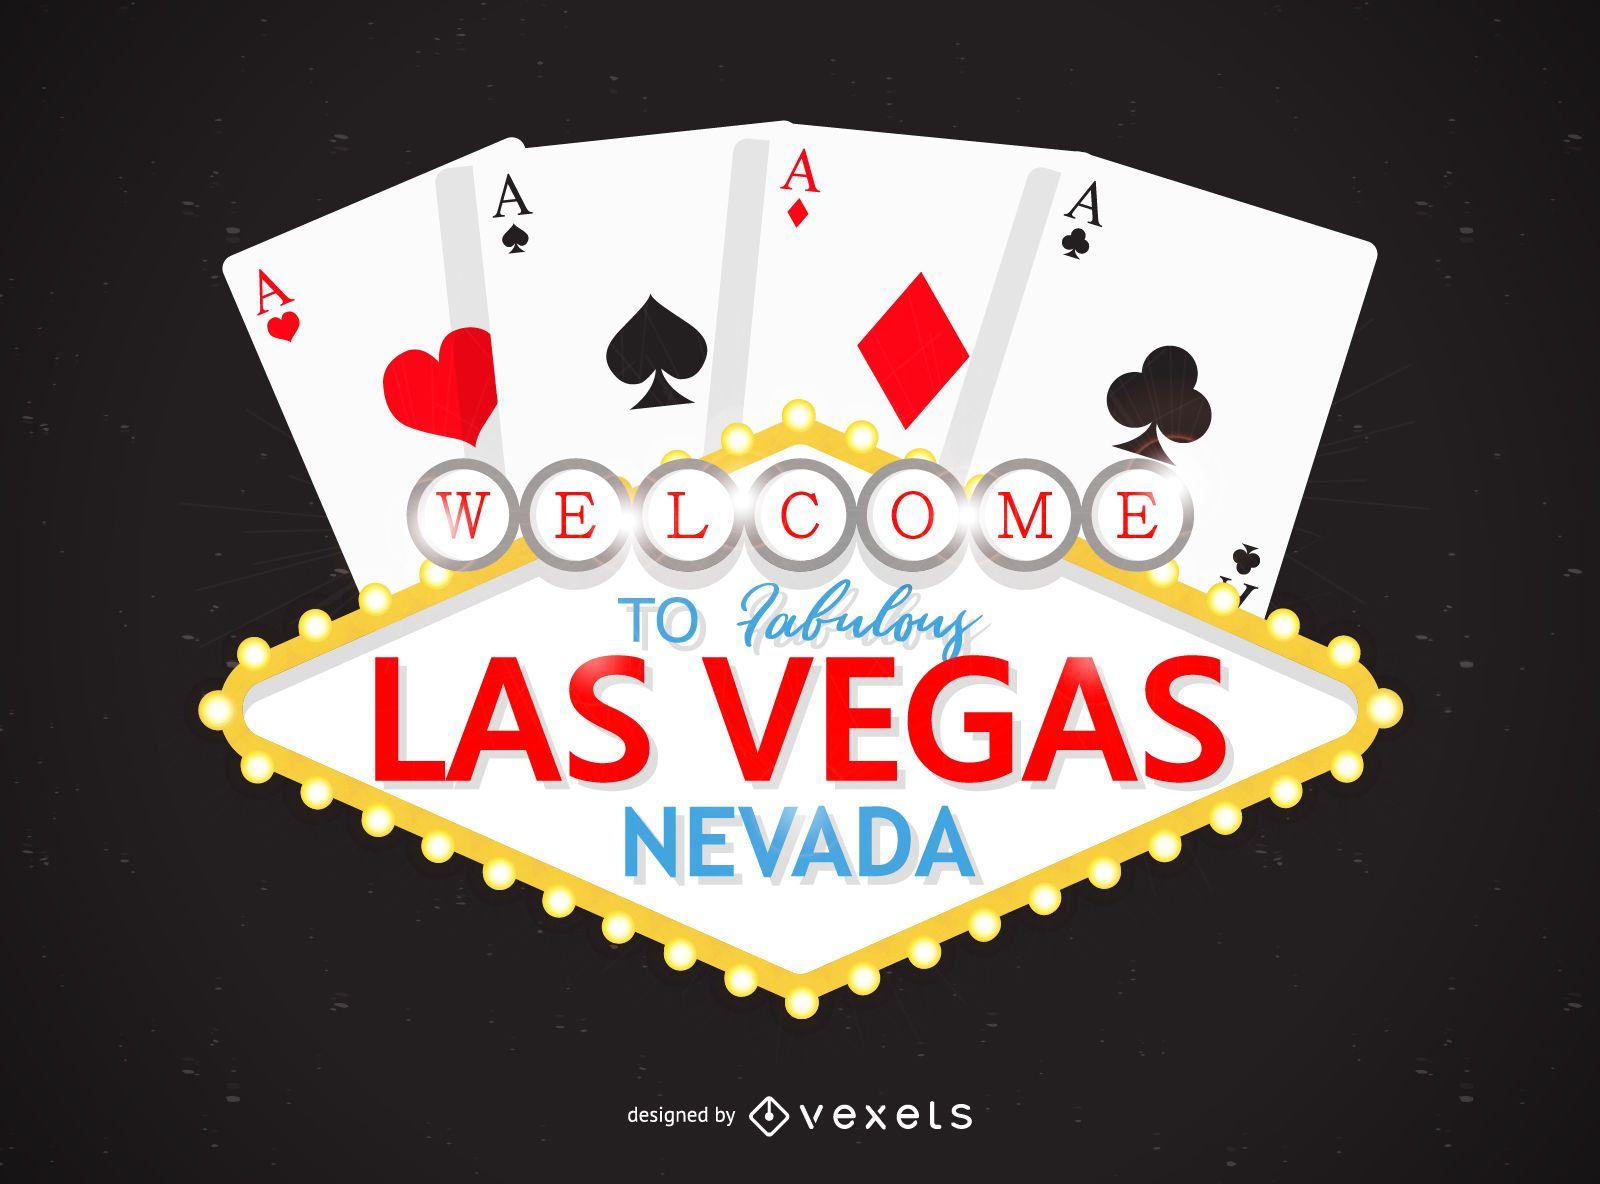 Las Vegas casino logo design